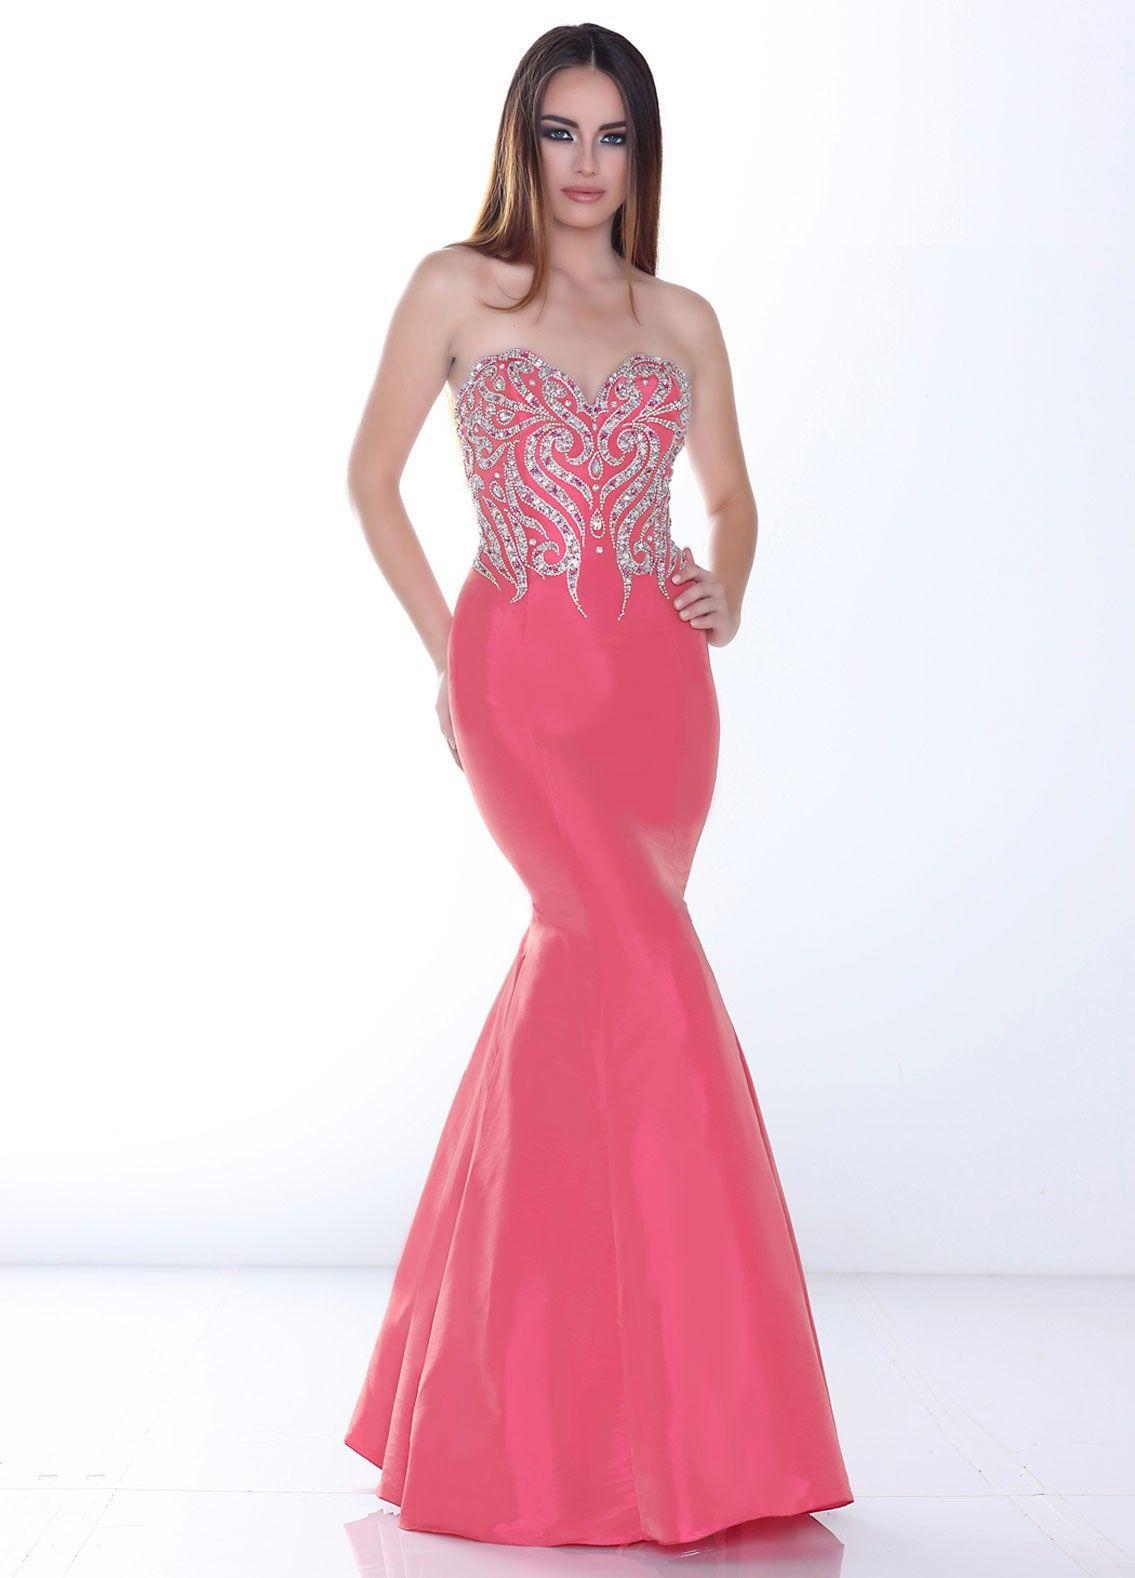 Captivating sweetheart pink trumpet mermaid military ball dress